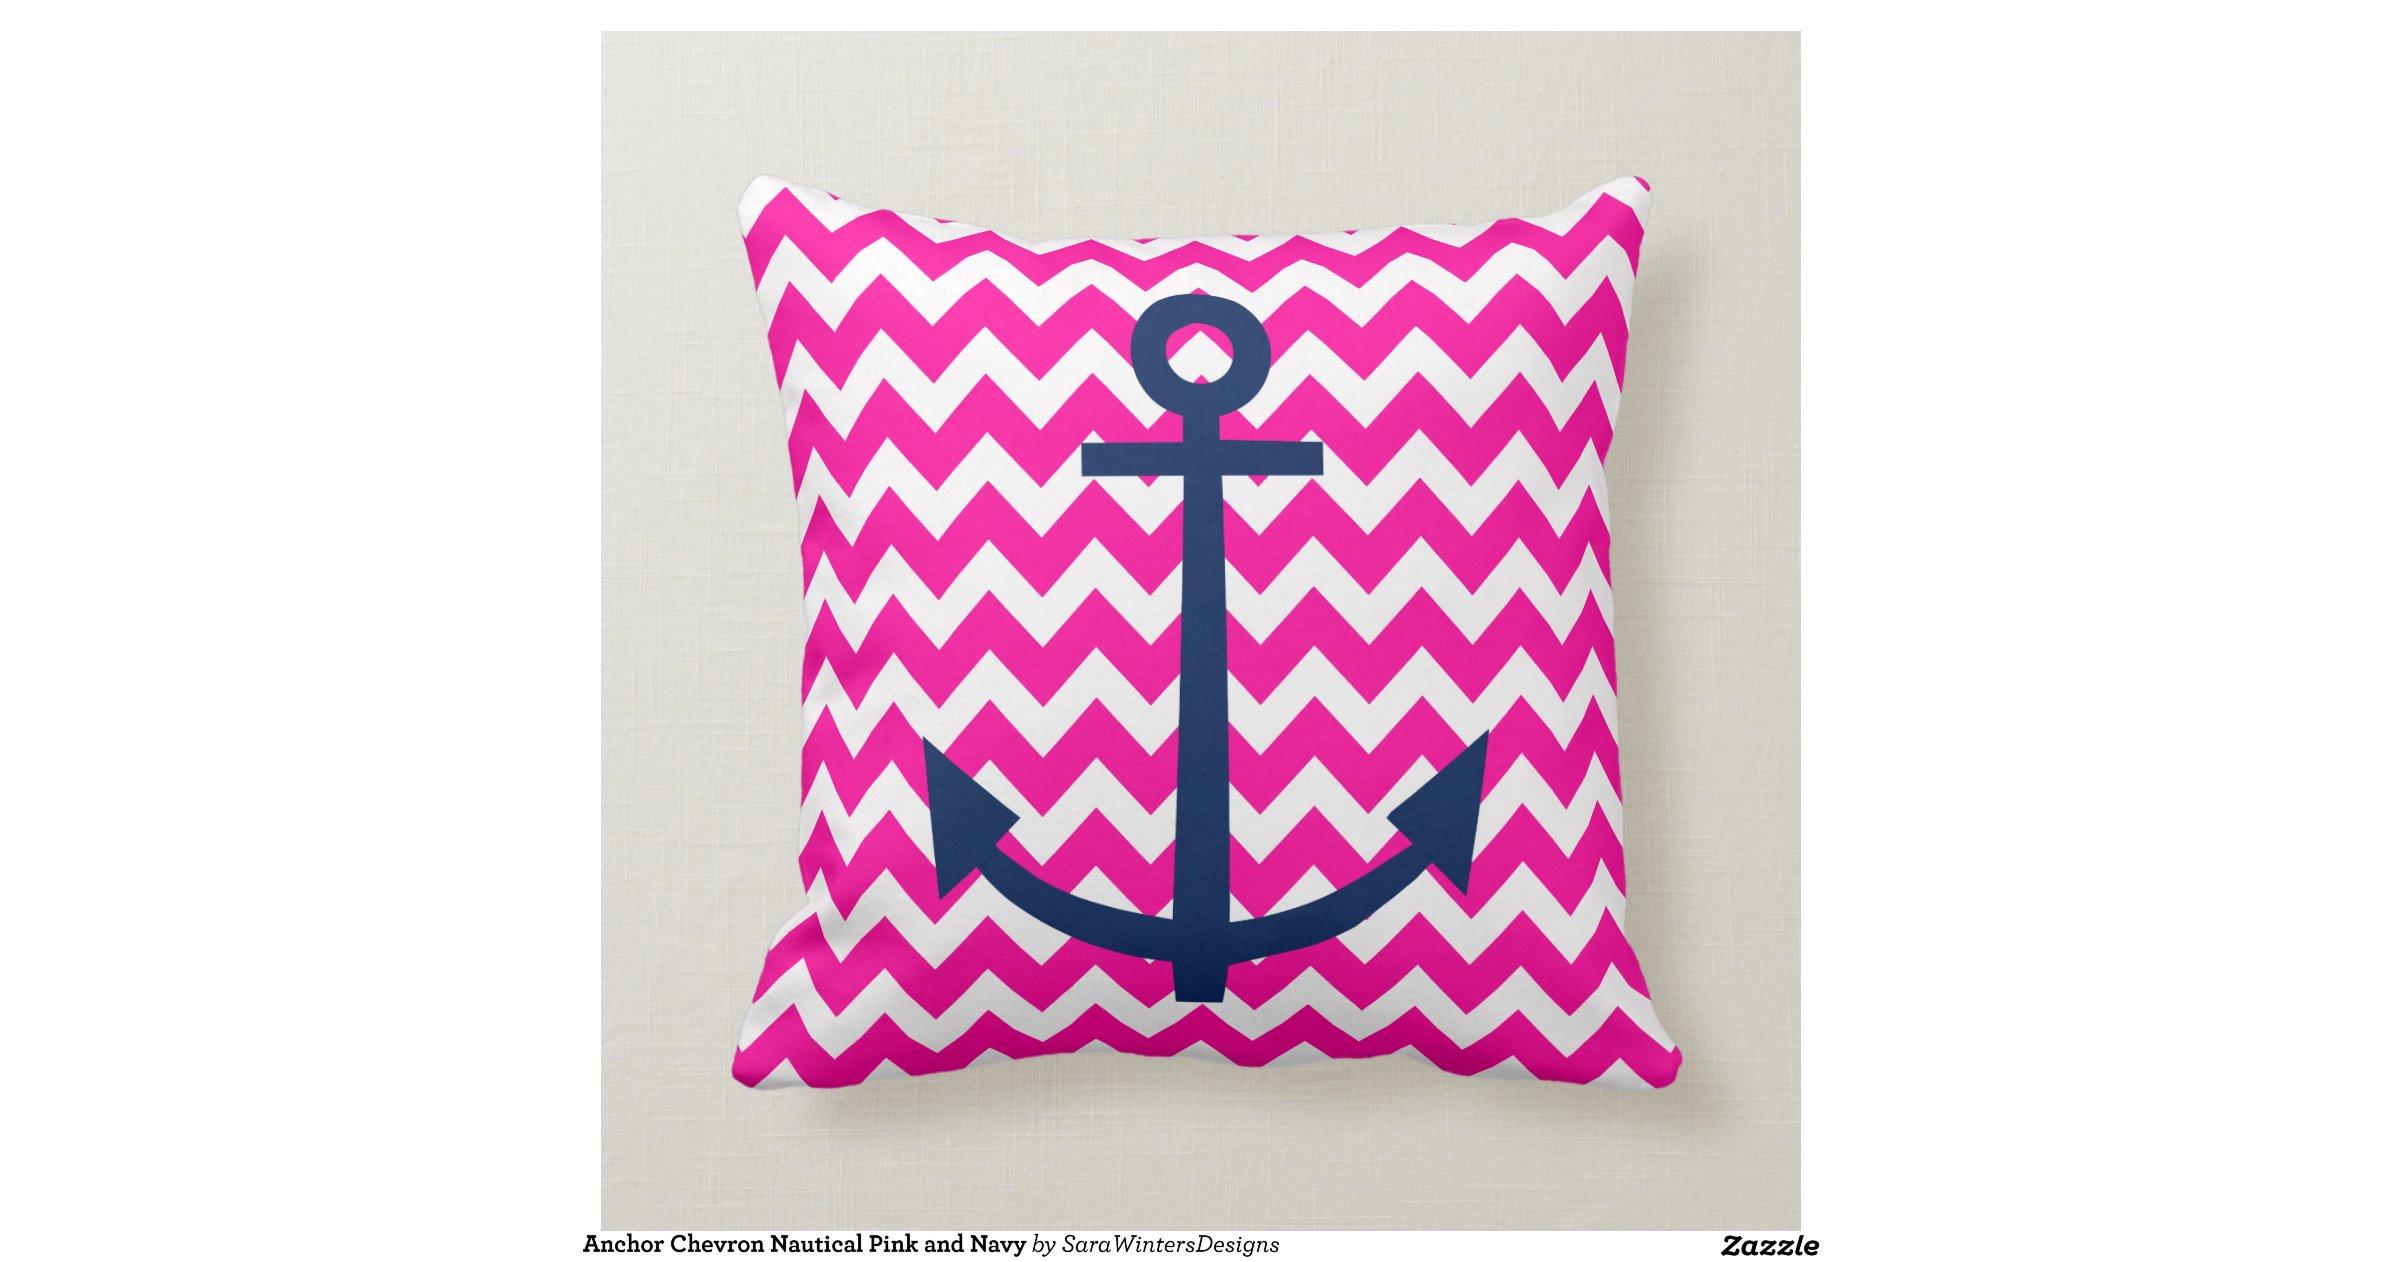 Navy And Pink Decorative Pillows: Anchor_chevron_nautical_pink_and_navy_throw_pillow